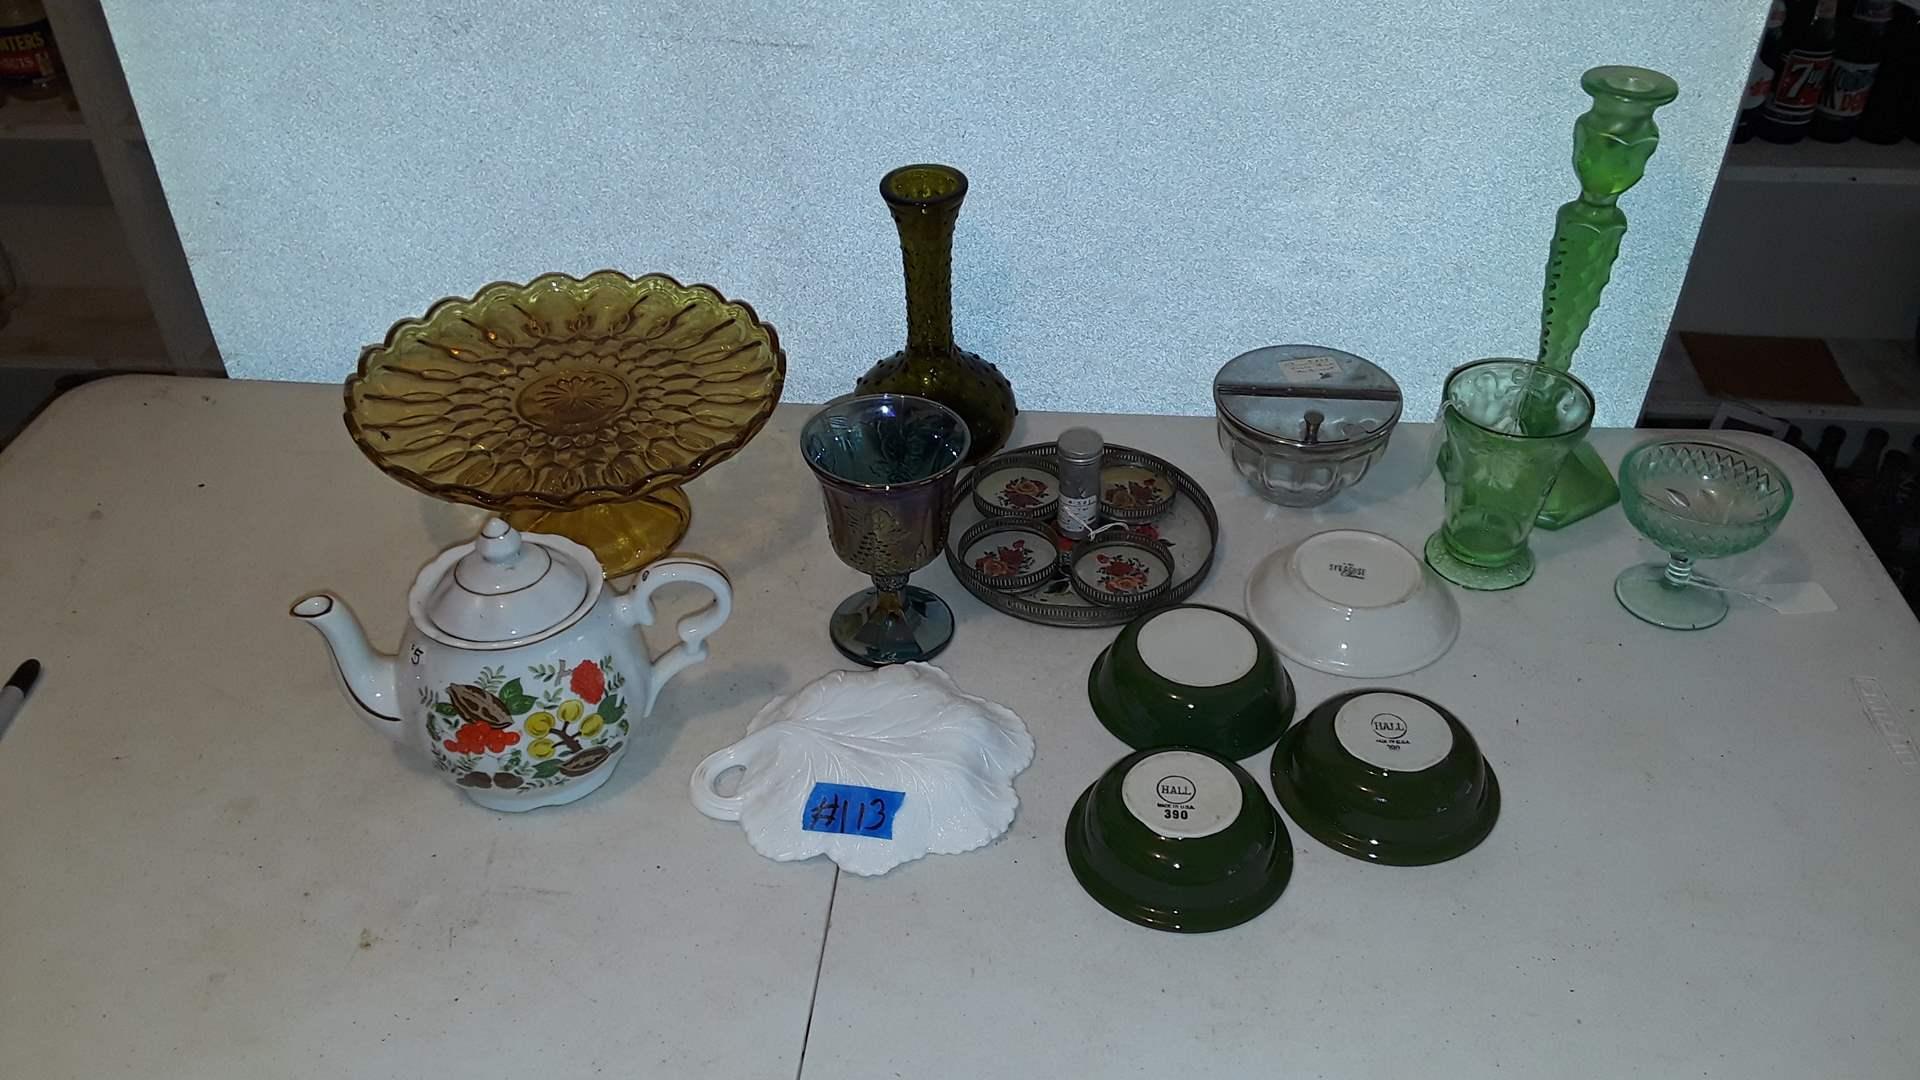 Lot # 113 ANTIQUE VINTAGE GLASSWARE, GREEN DEPRESSION GLASS